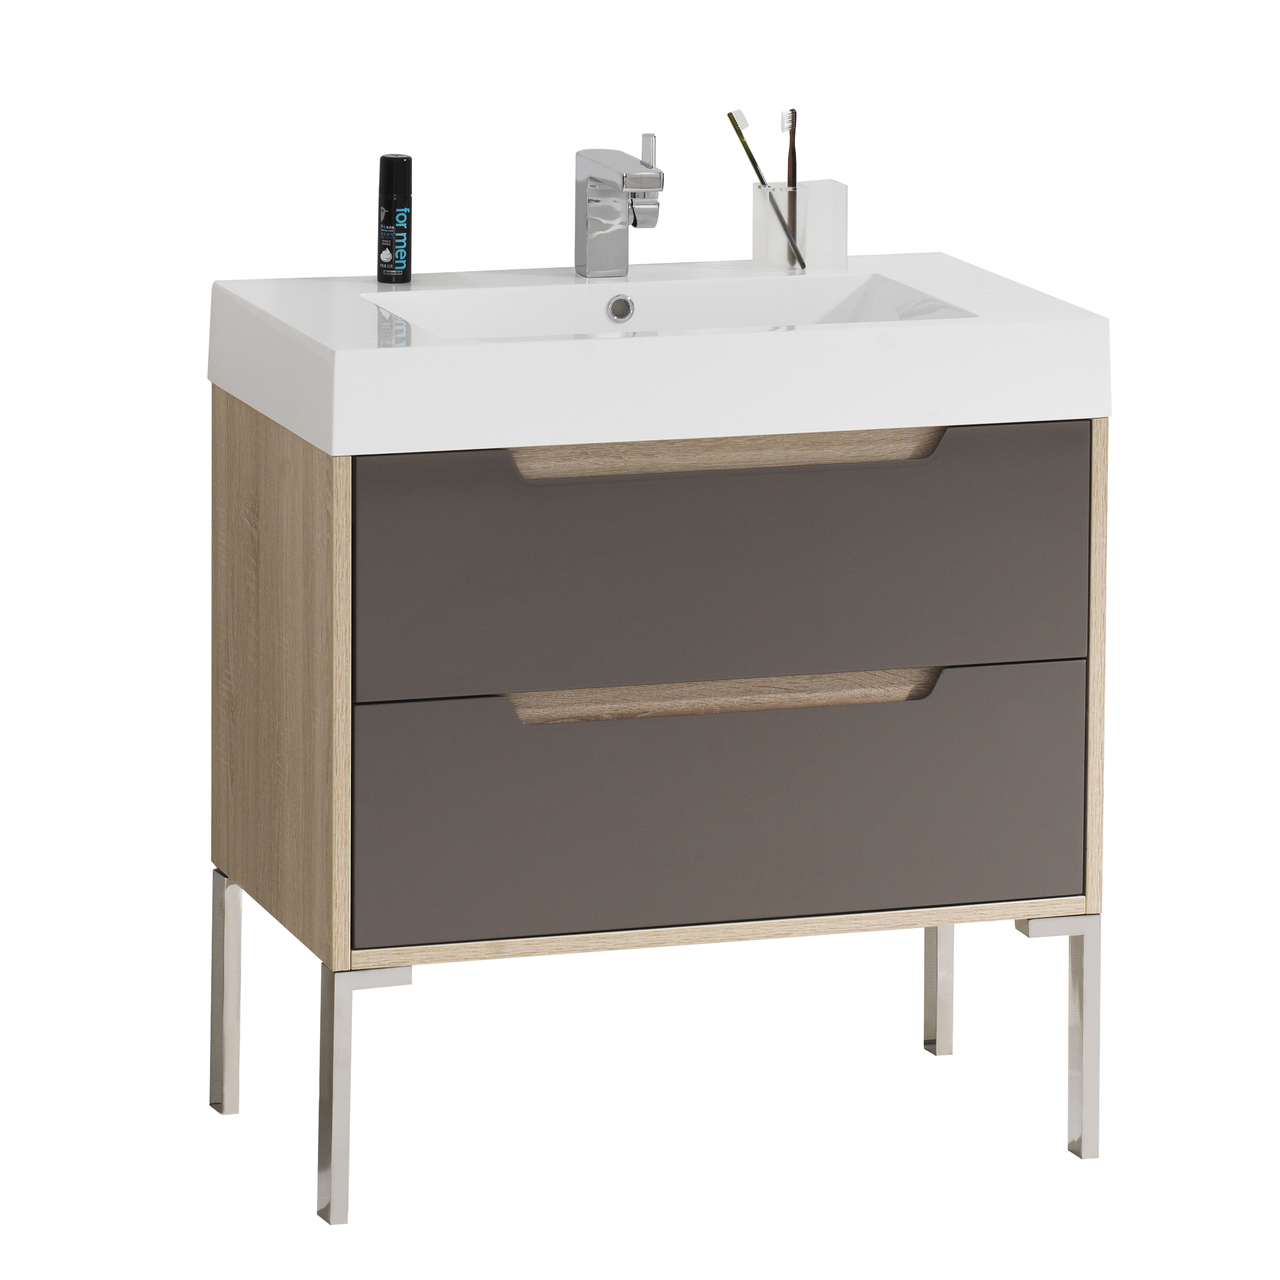 dyconn faucet vca80w32 bologna 32 bathroom vanity w one piece solid surface stone resin countertop basin vanity basin